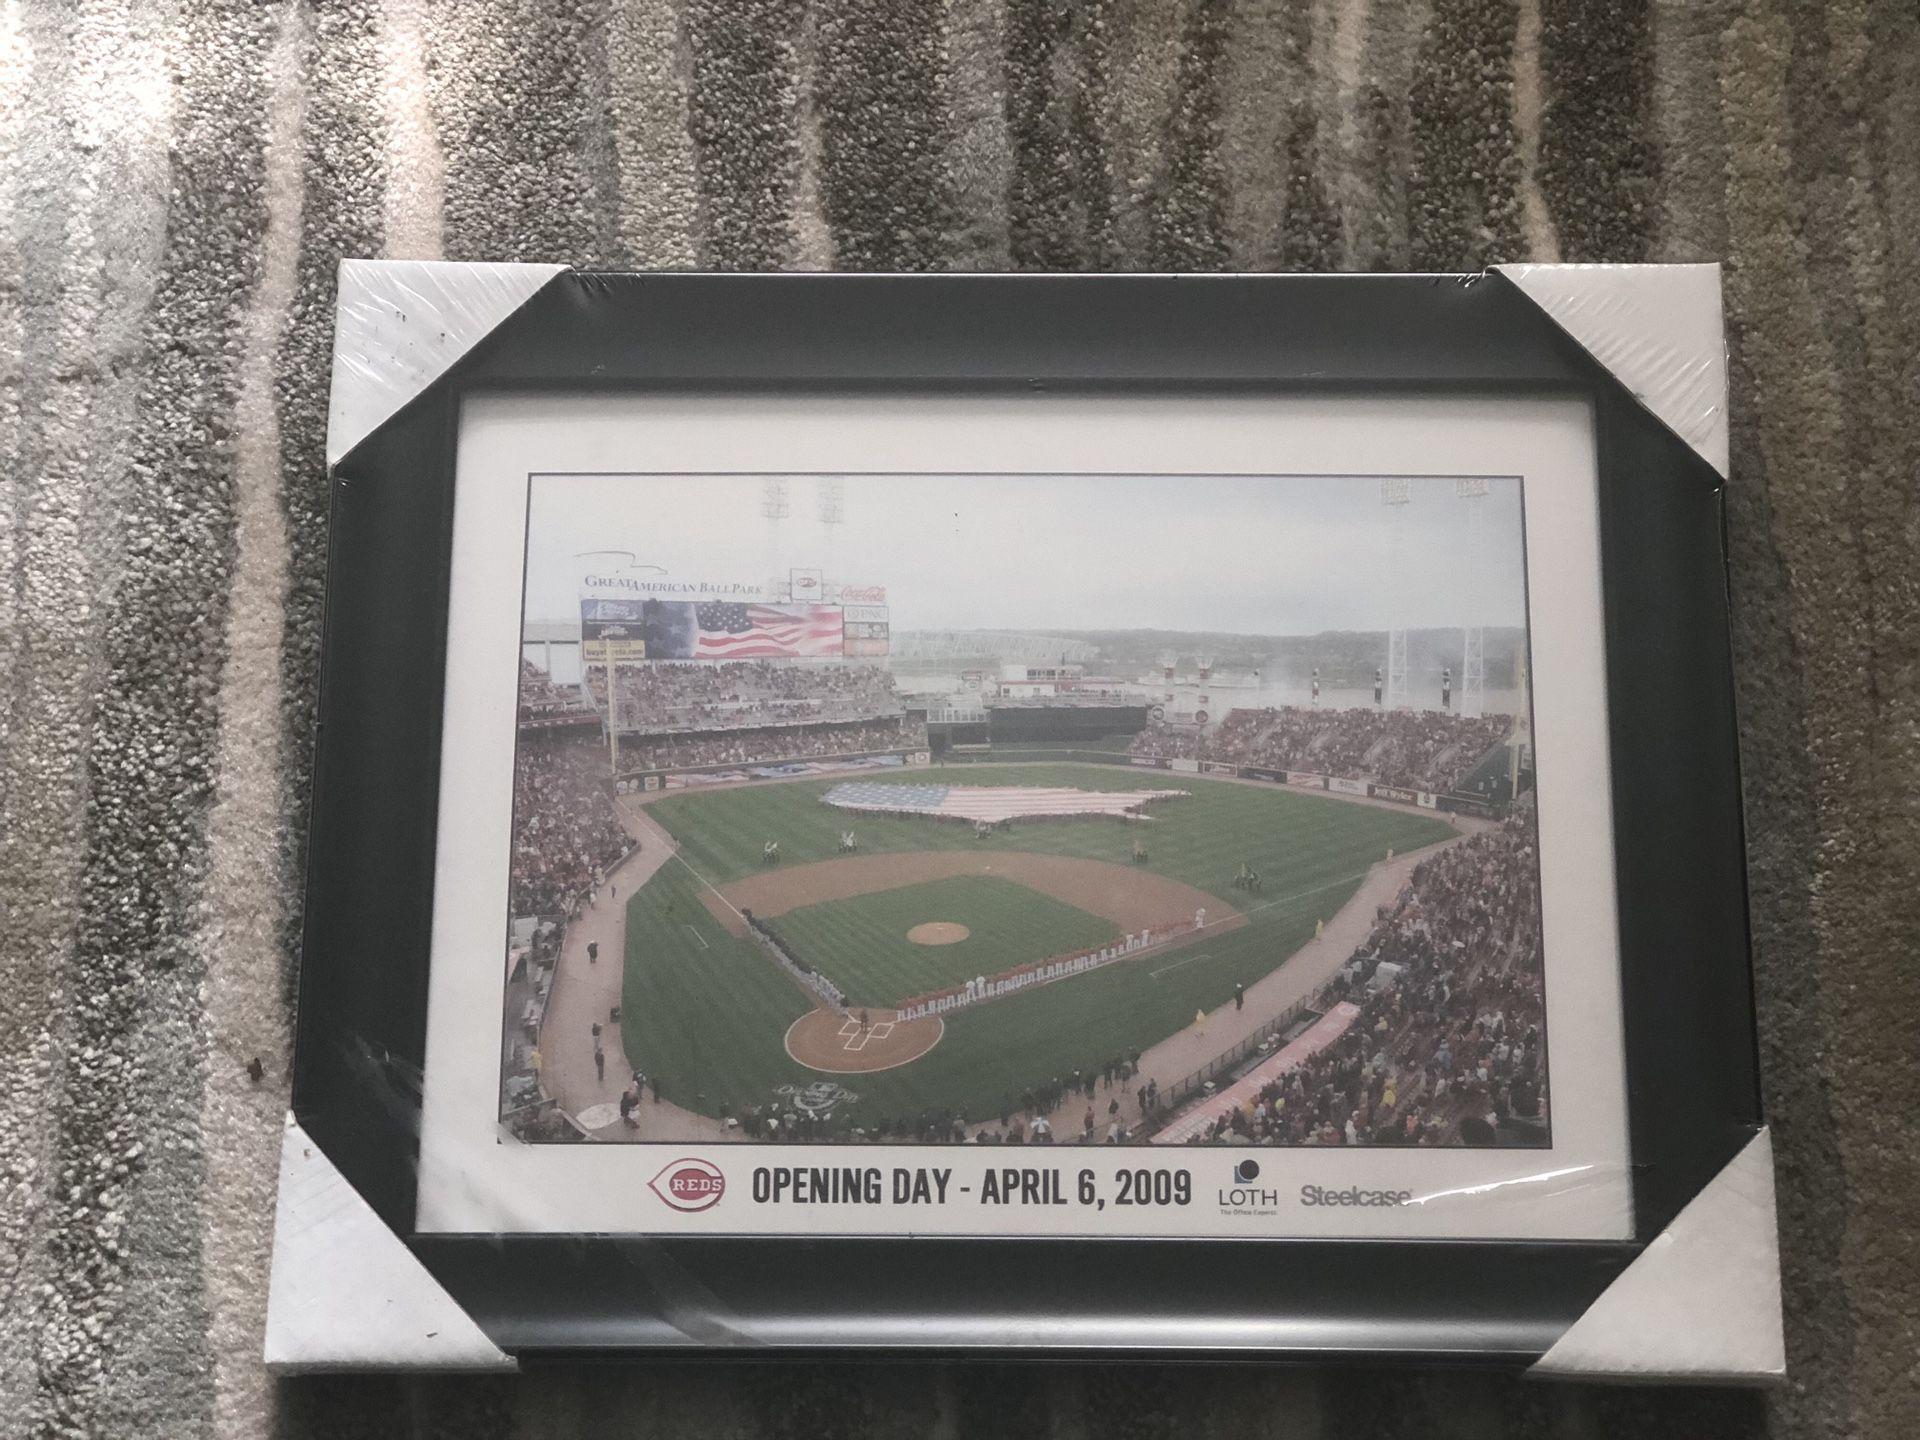 Cincinnati Reds Opening Day - April 6, 2009 Framed Photo